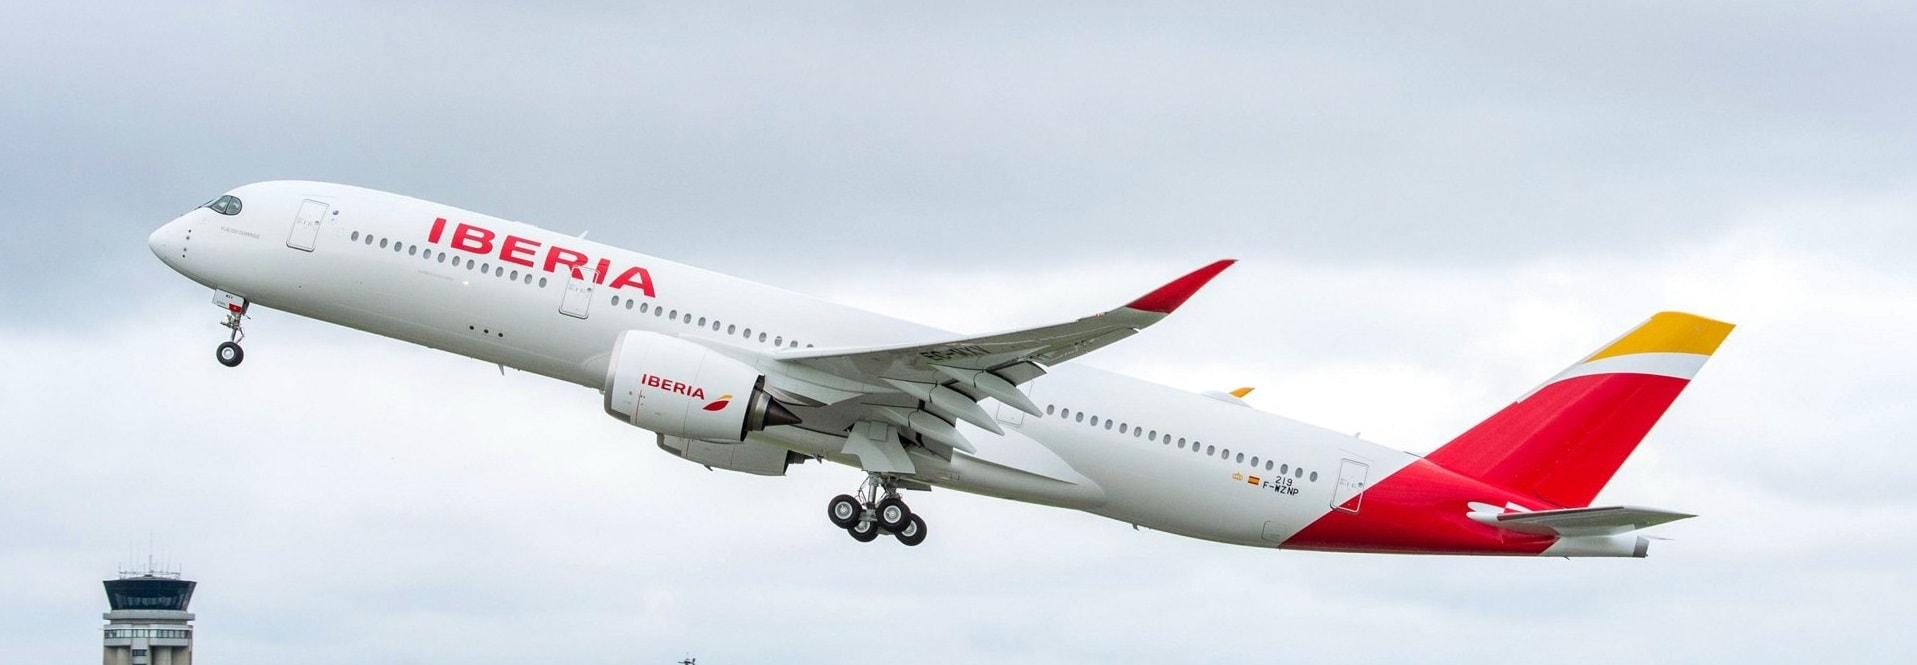 Iberia's A350 plane